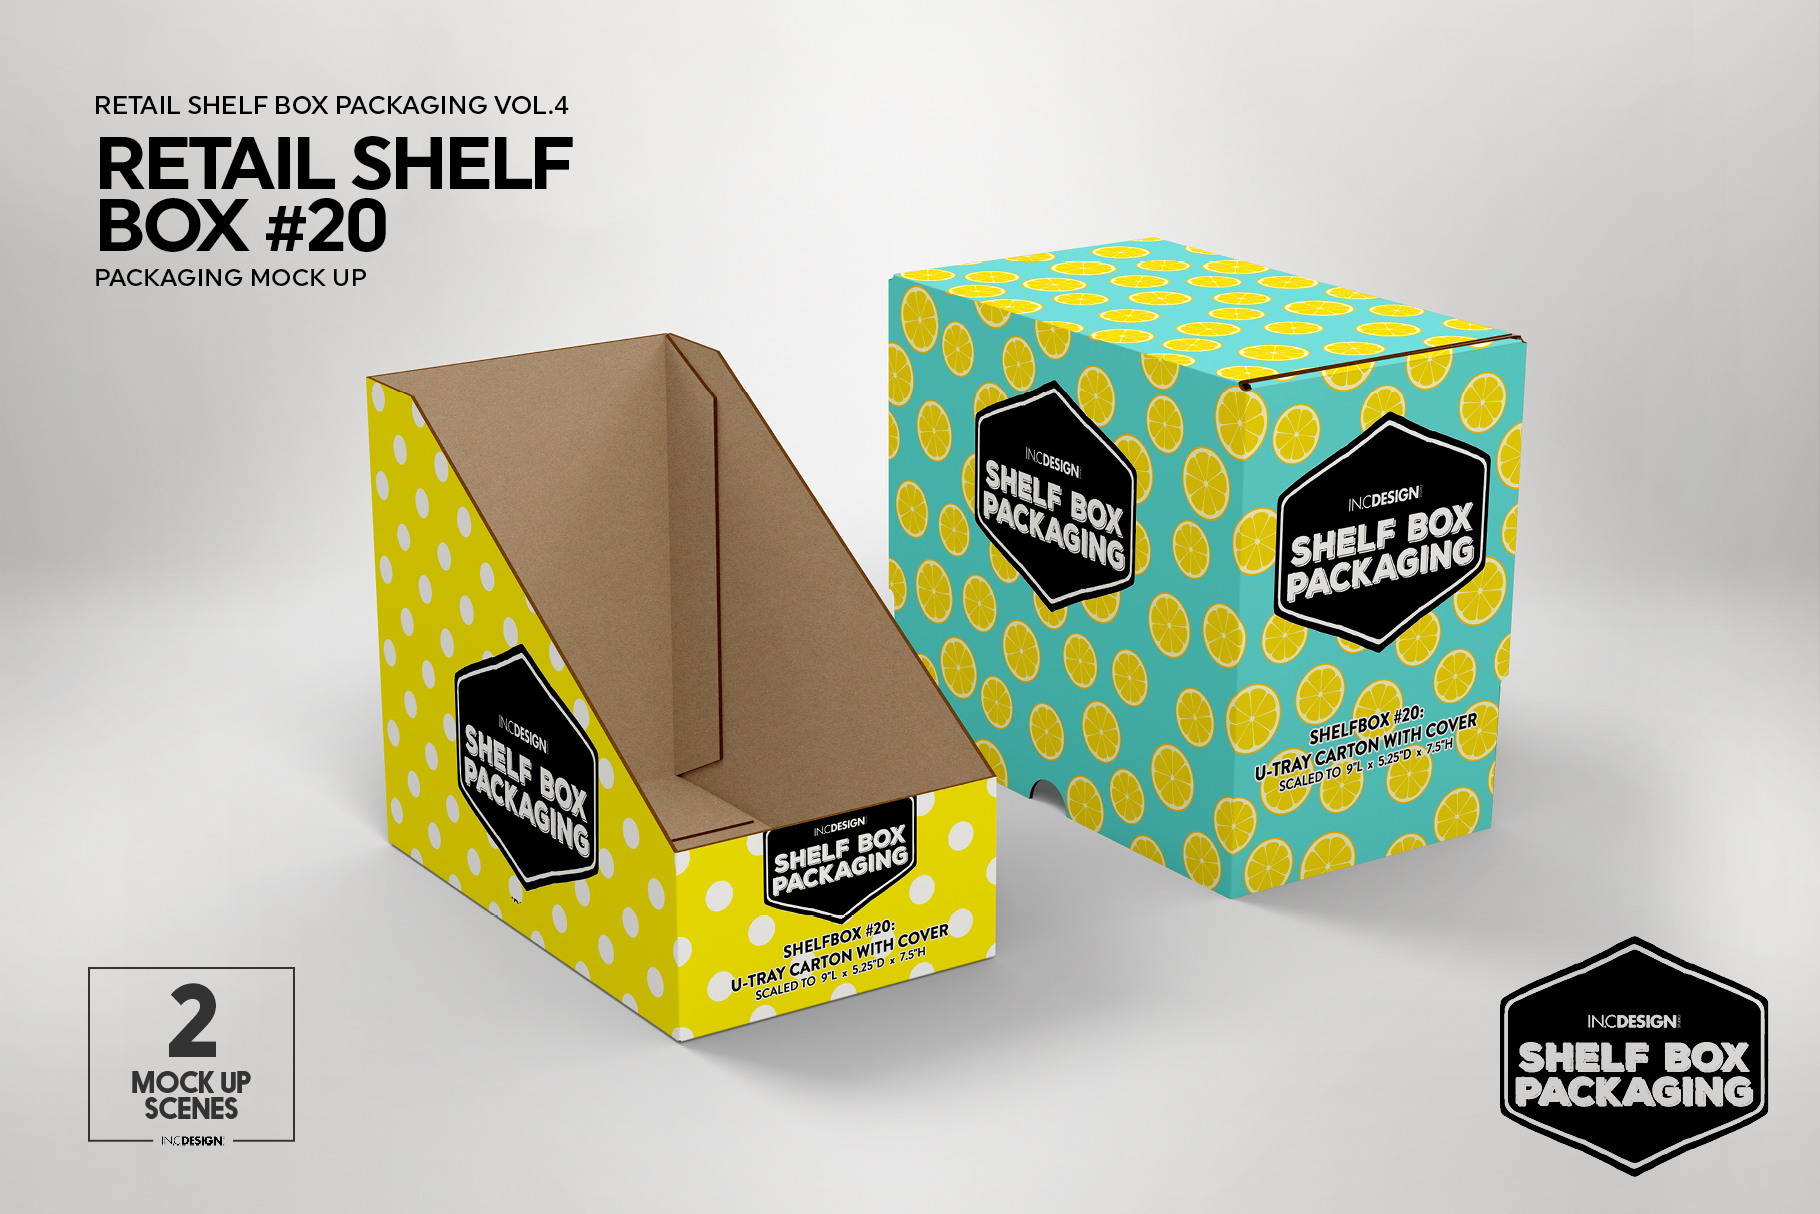 Retail Shelf Box 20 Packaging Mockup example image 3